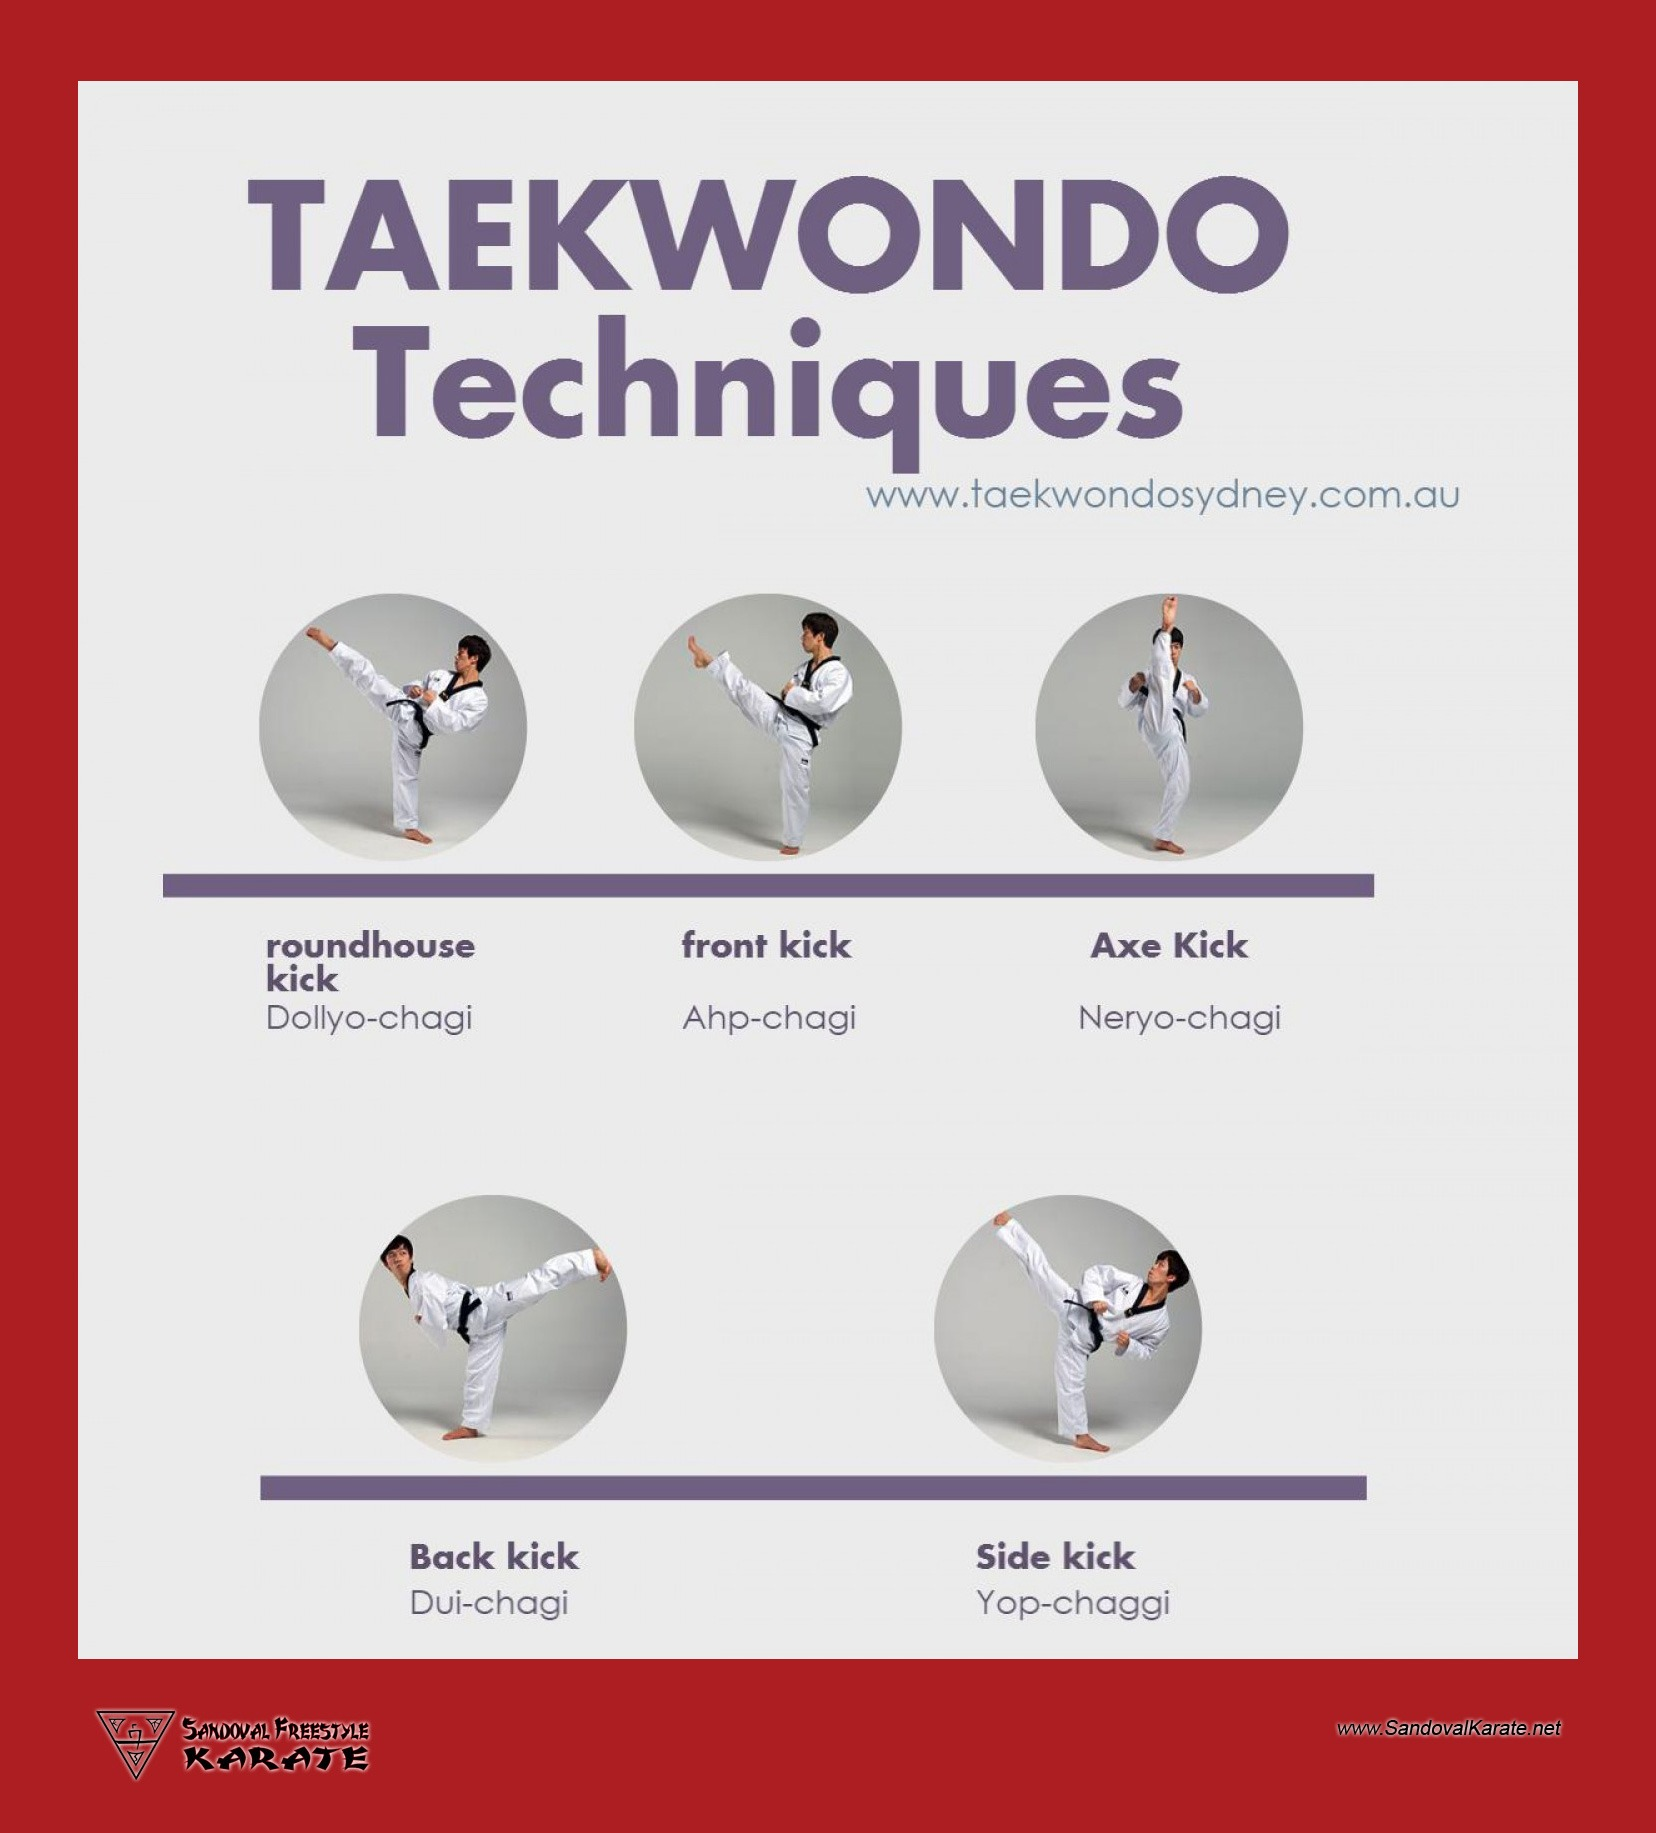 Taekwondo Techniques Infographic